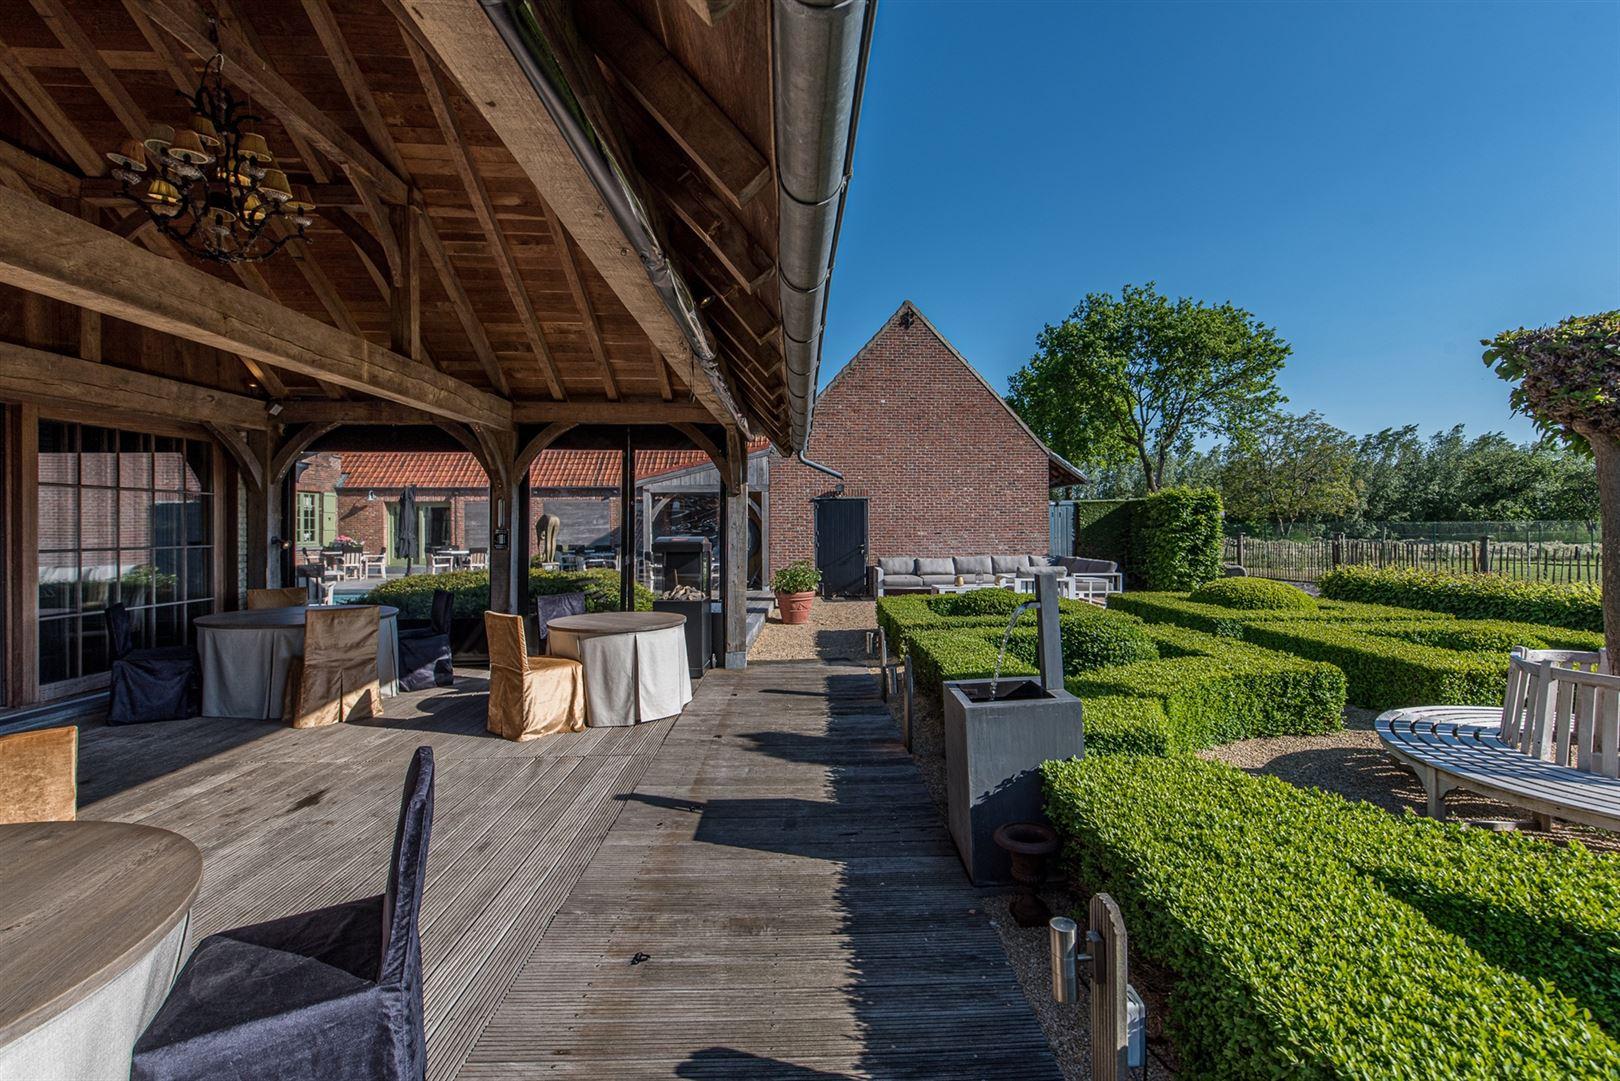 Foto 38 : Handelspand te 9160 LOKEREN (België) - Prijs € 1.400.000